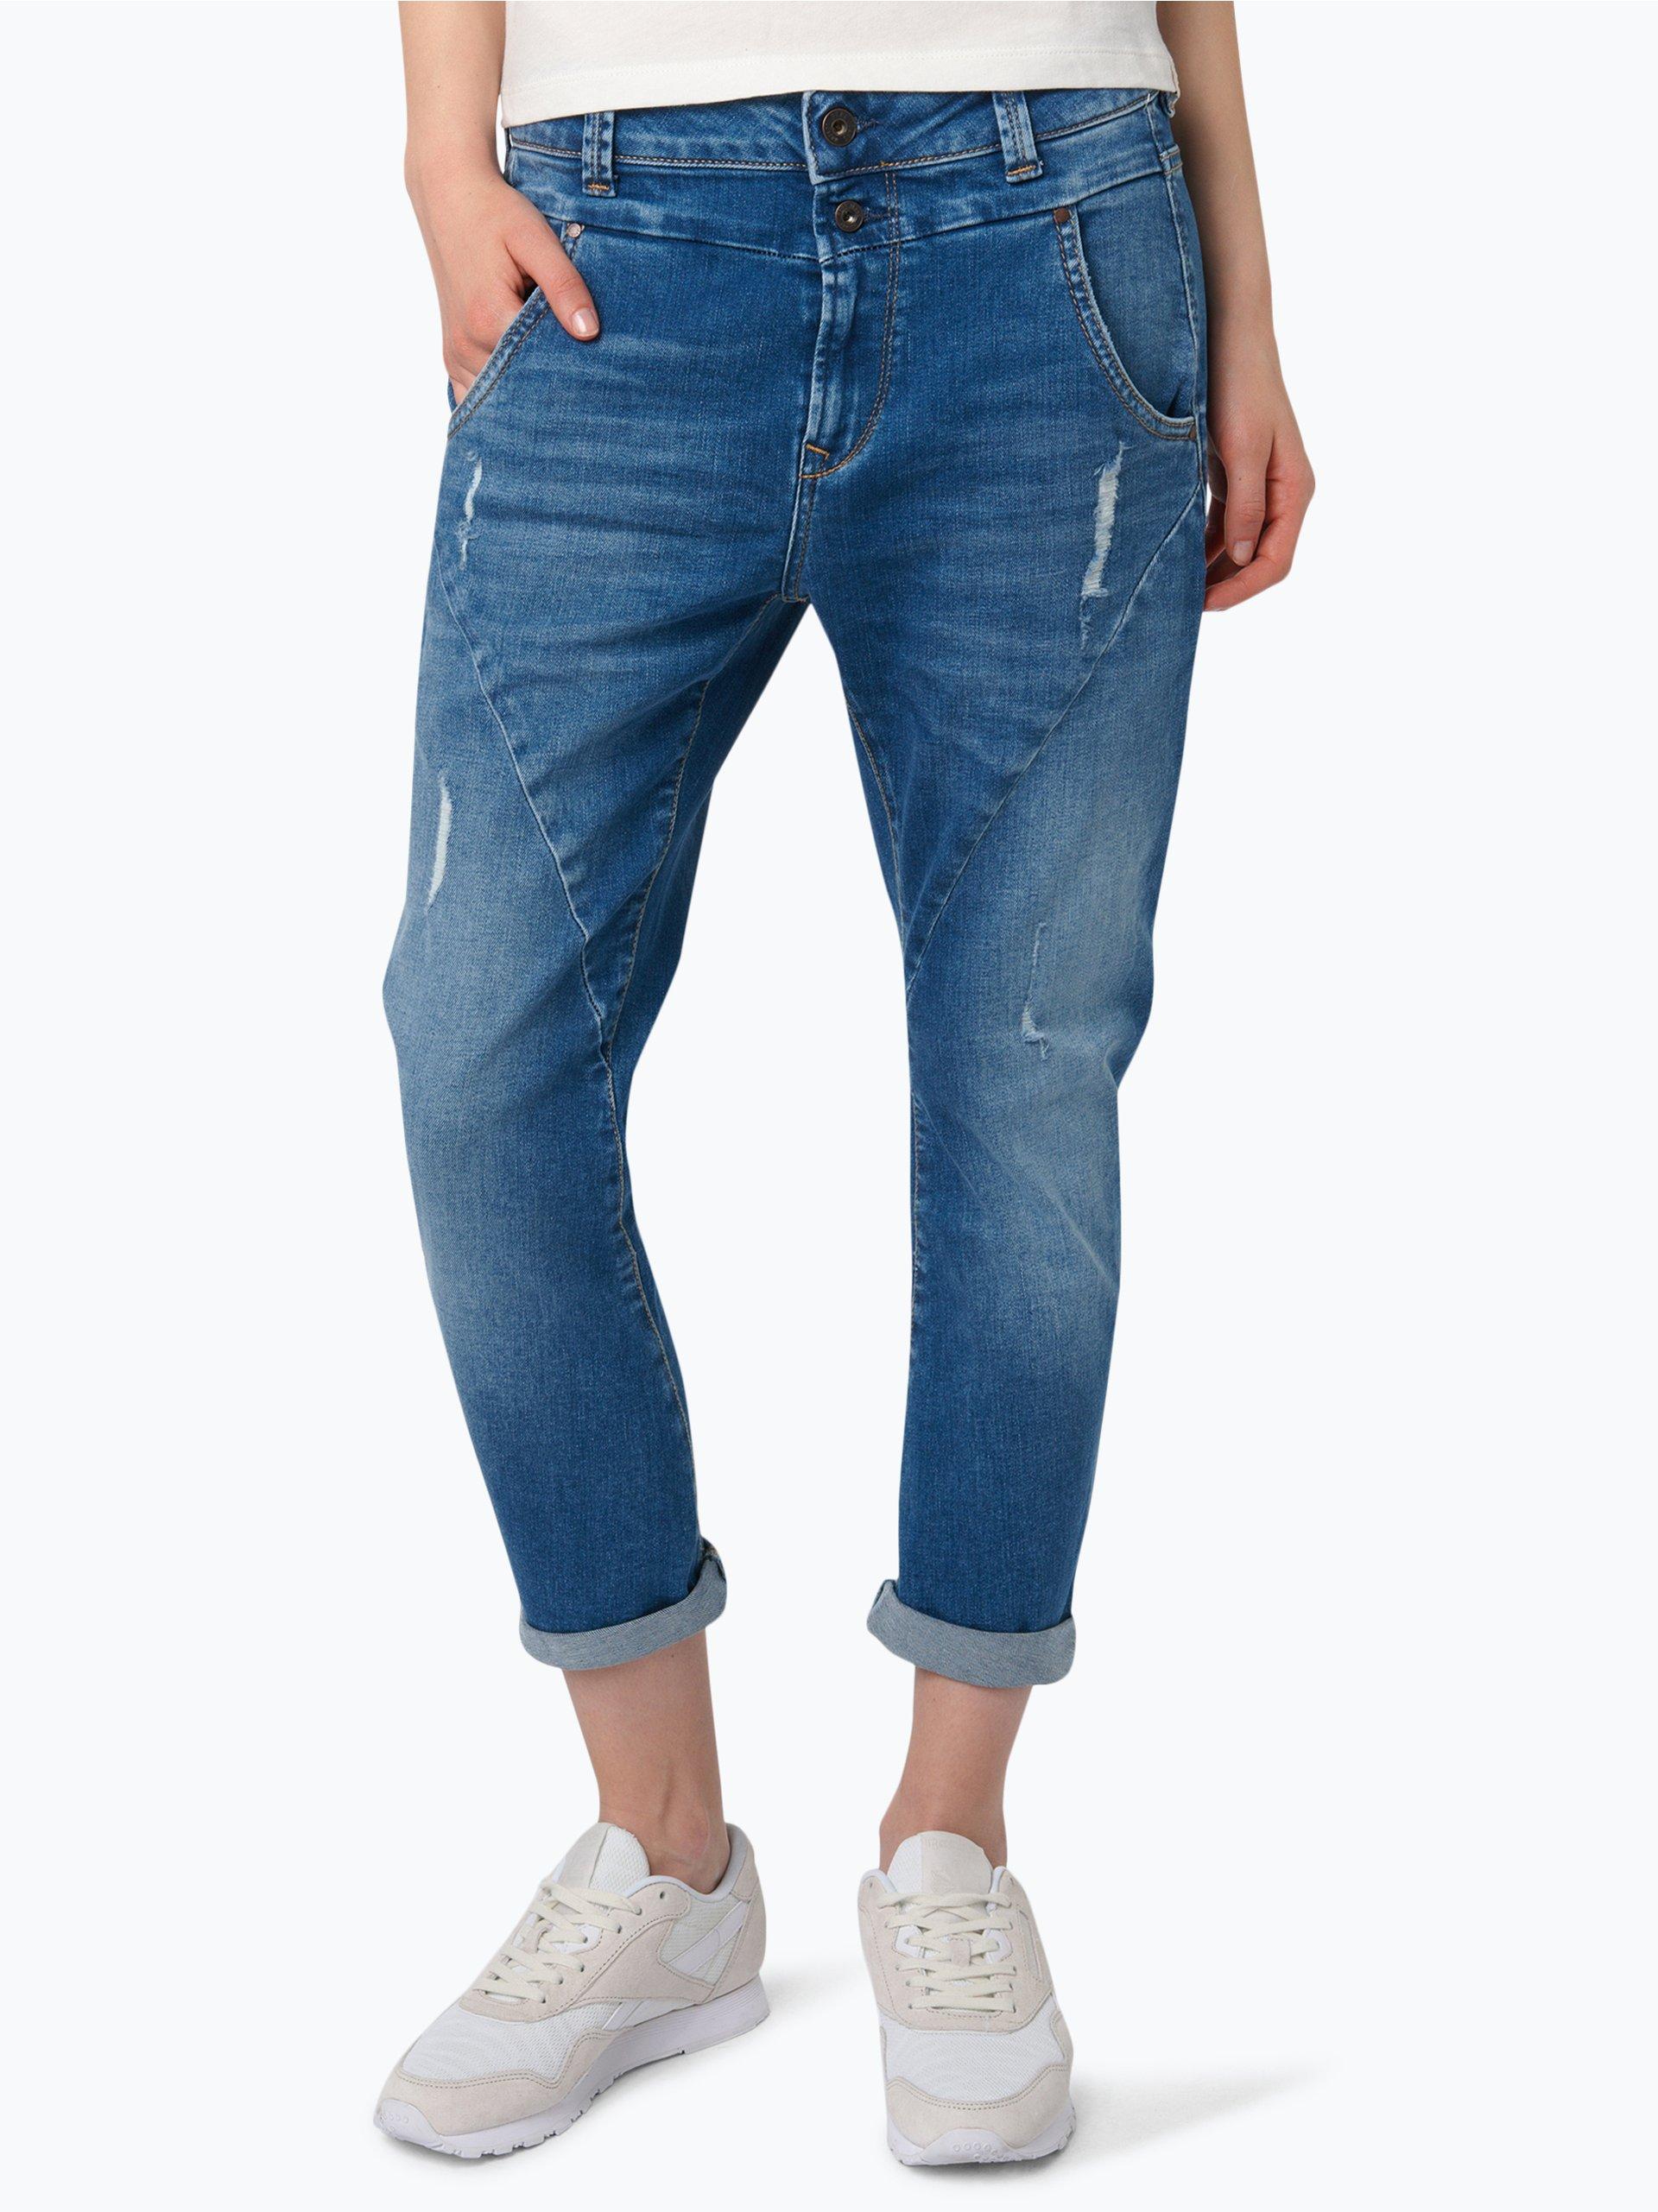 pepe jeans damen jeans topsy 2 online kaufen peek und cloppenburg de. Black Bedroom Furniture Sets. Home Design Ideas